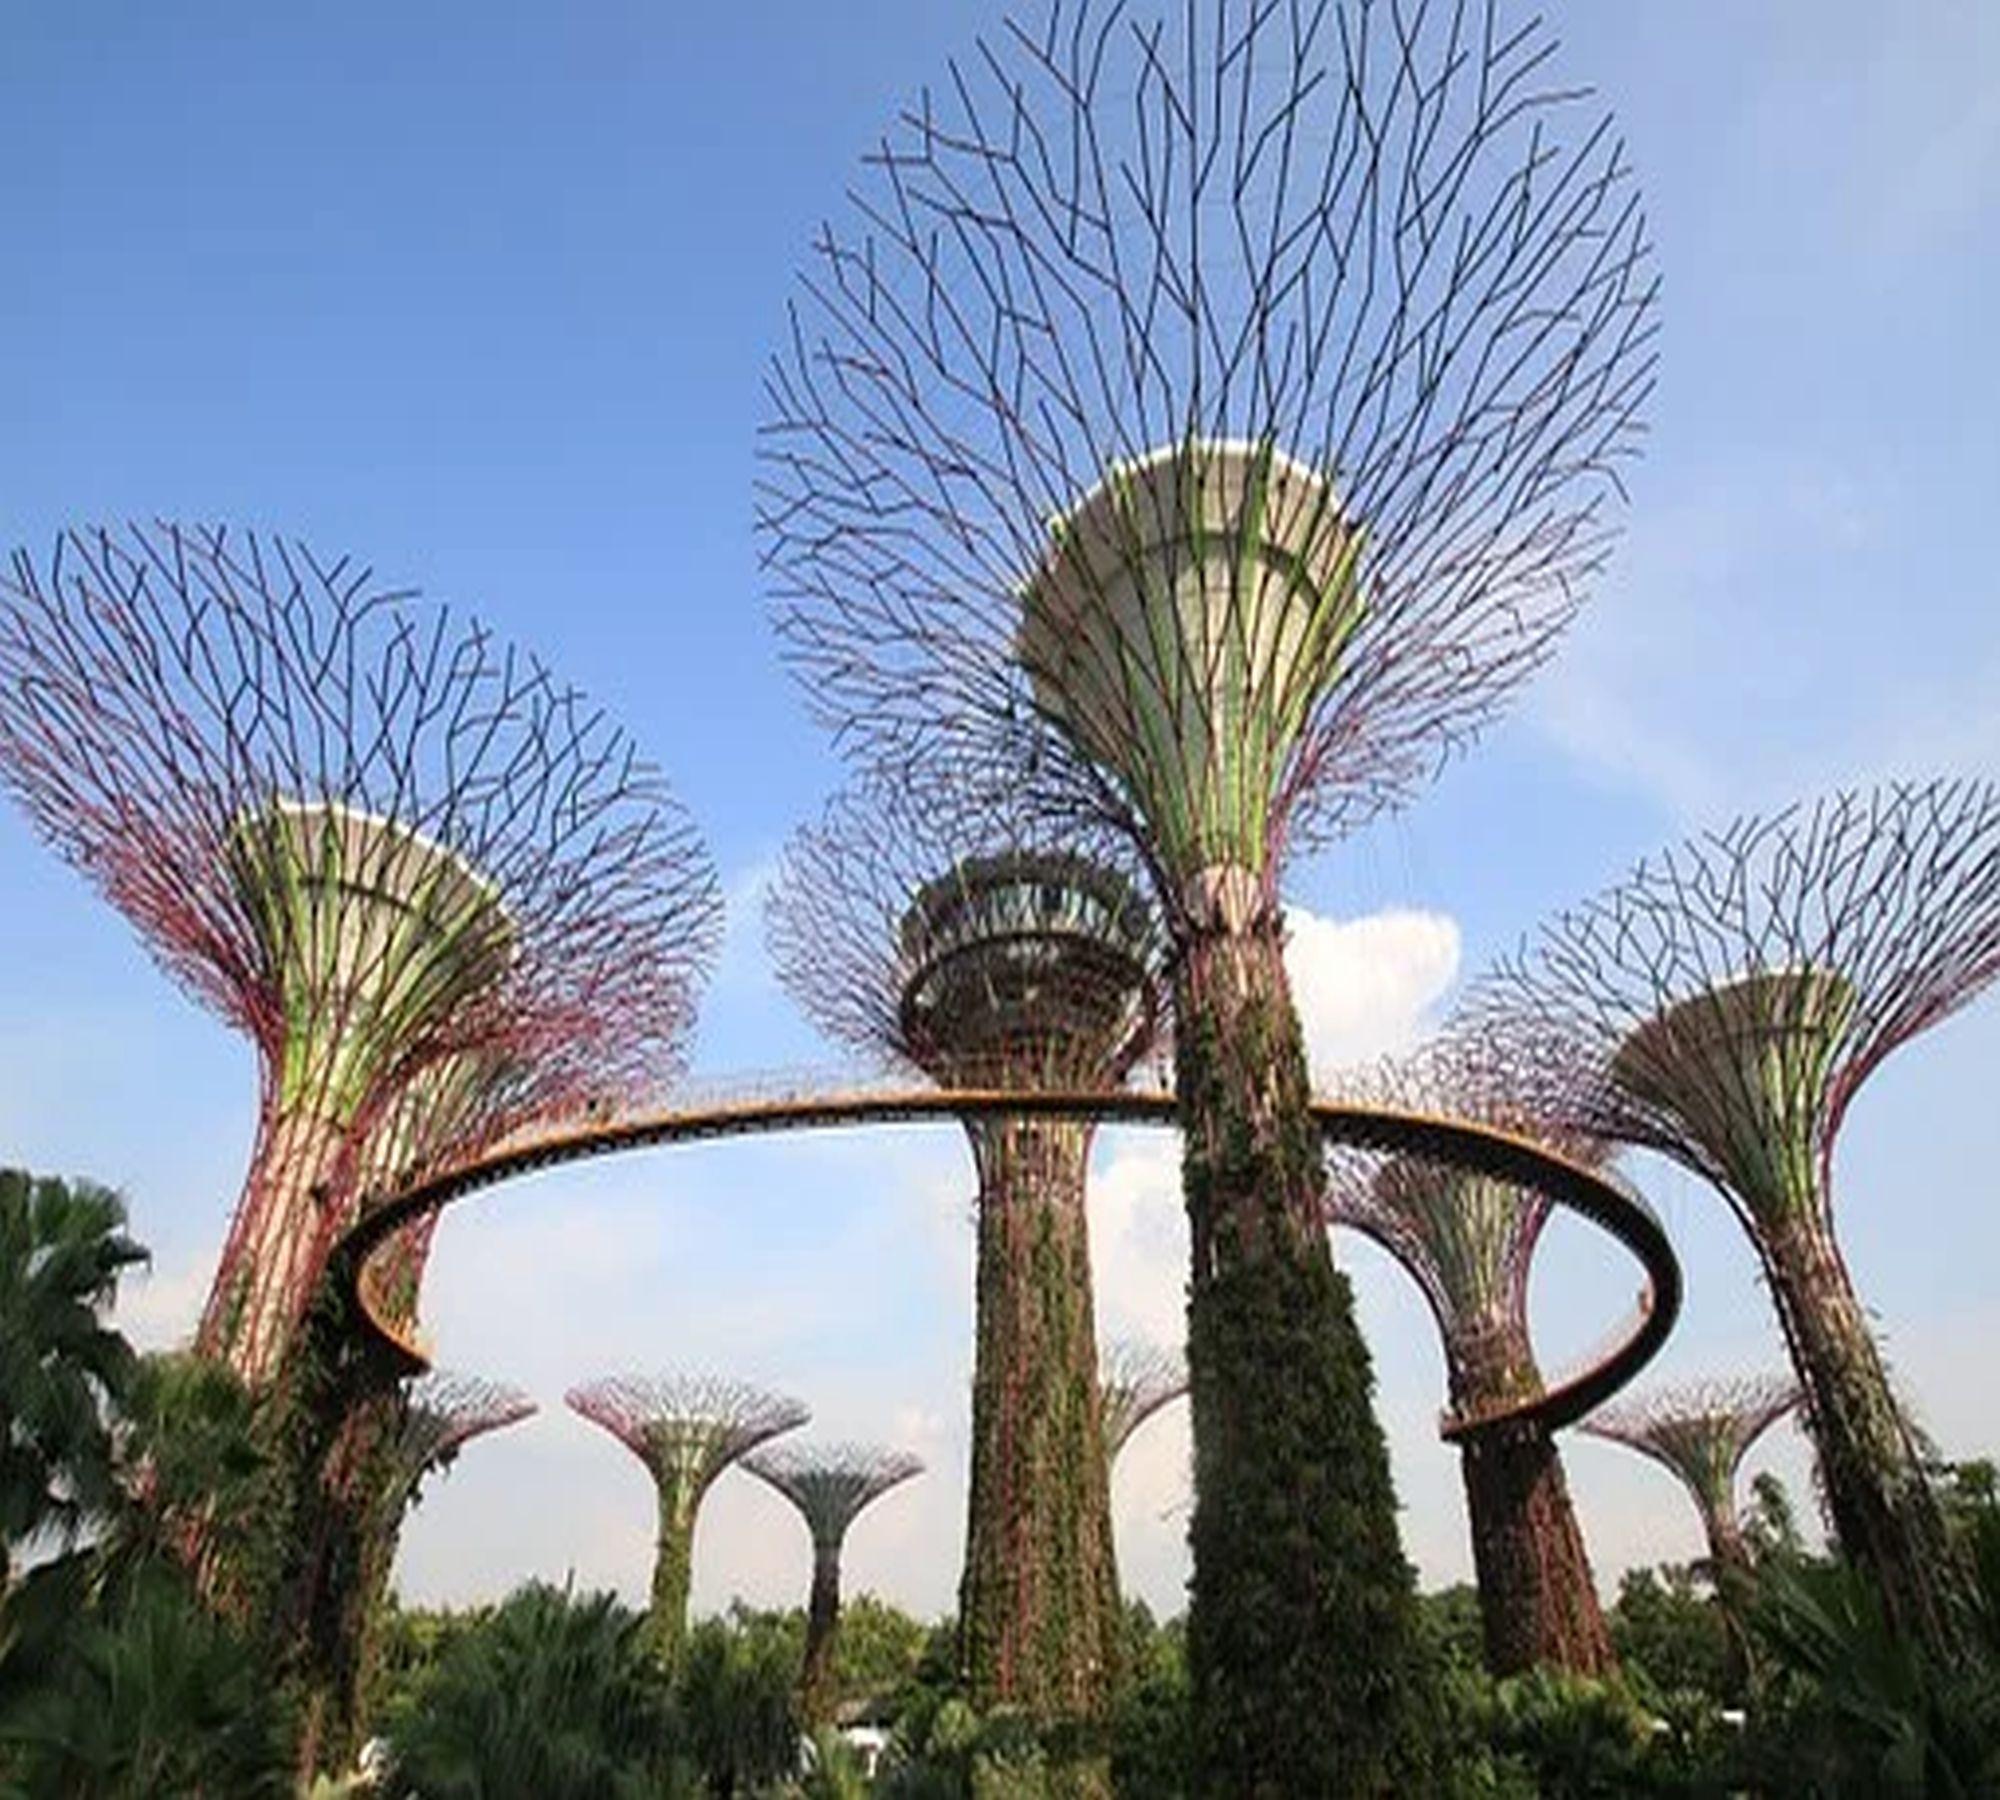 Getting an e-Visa for Singapore